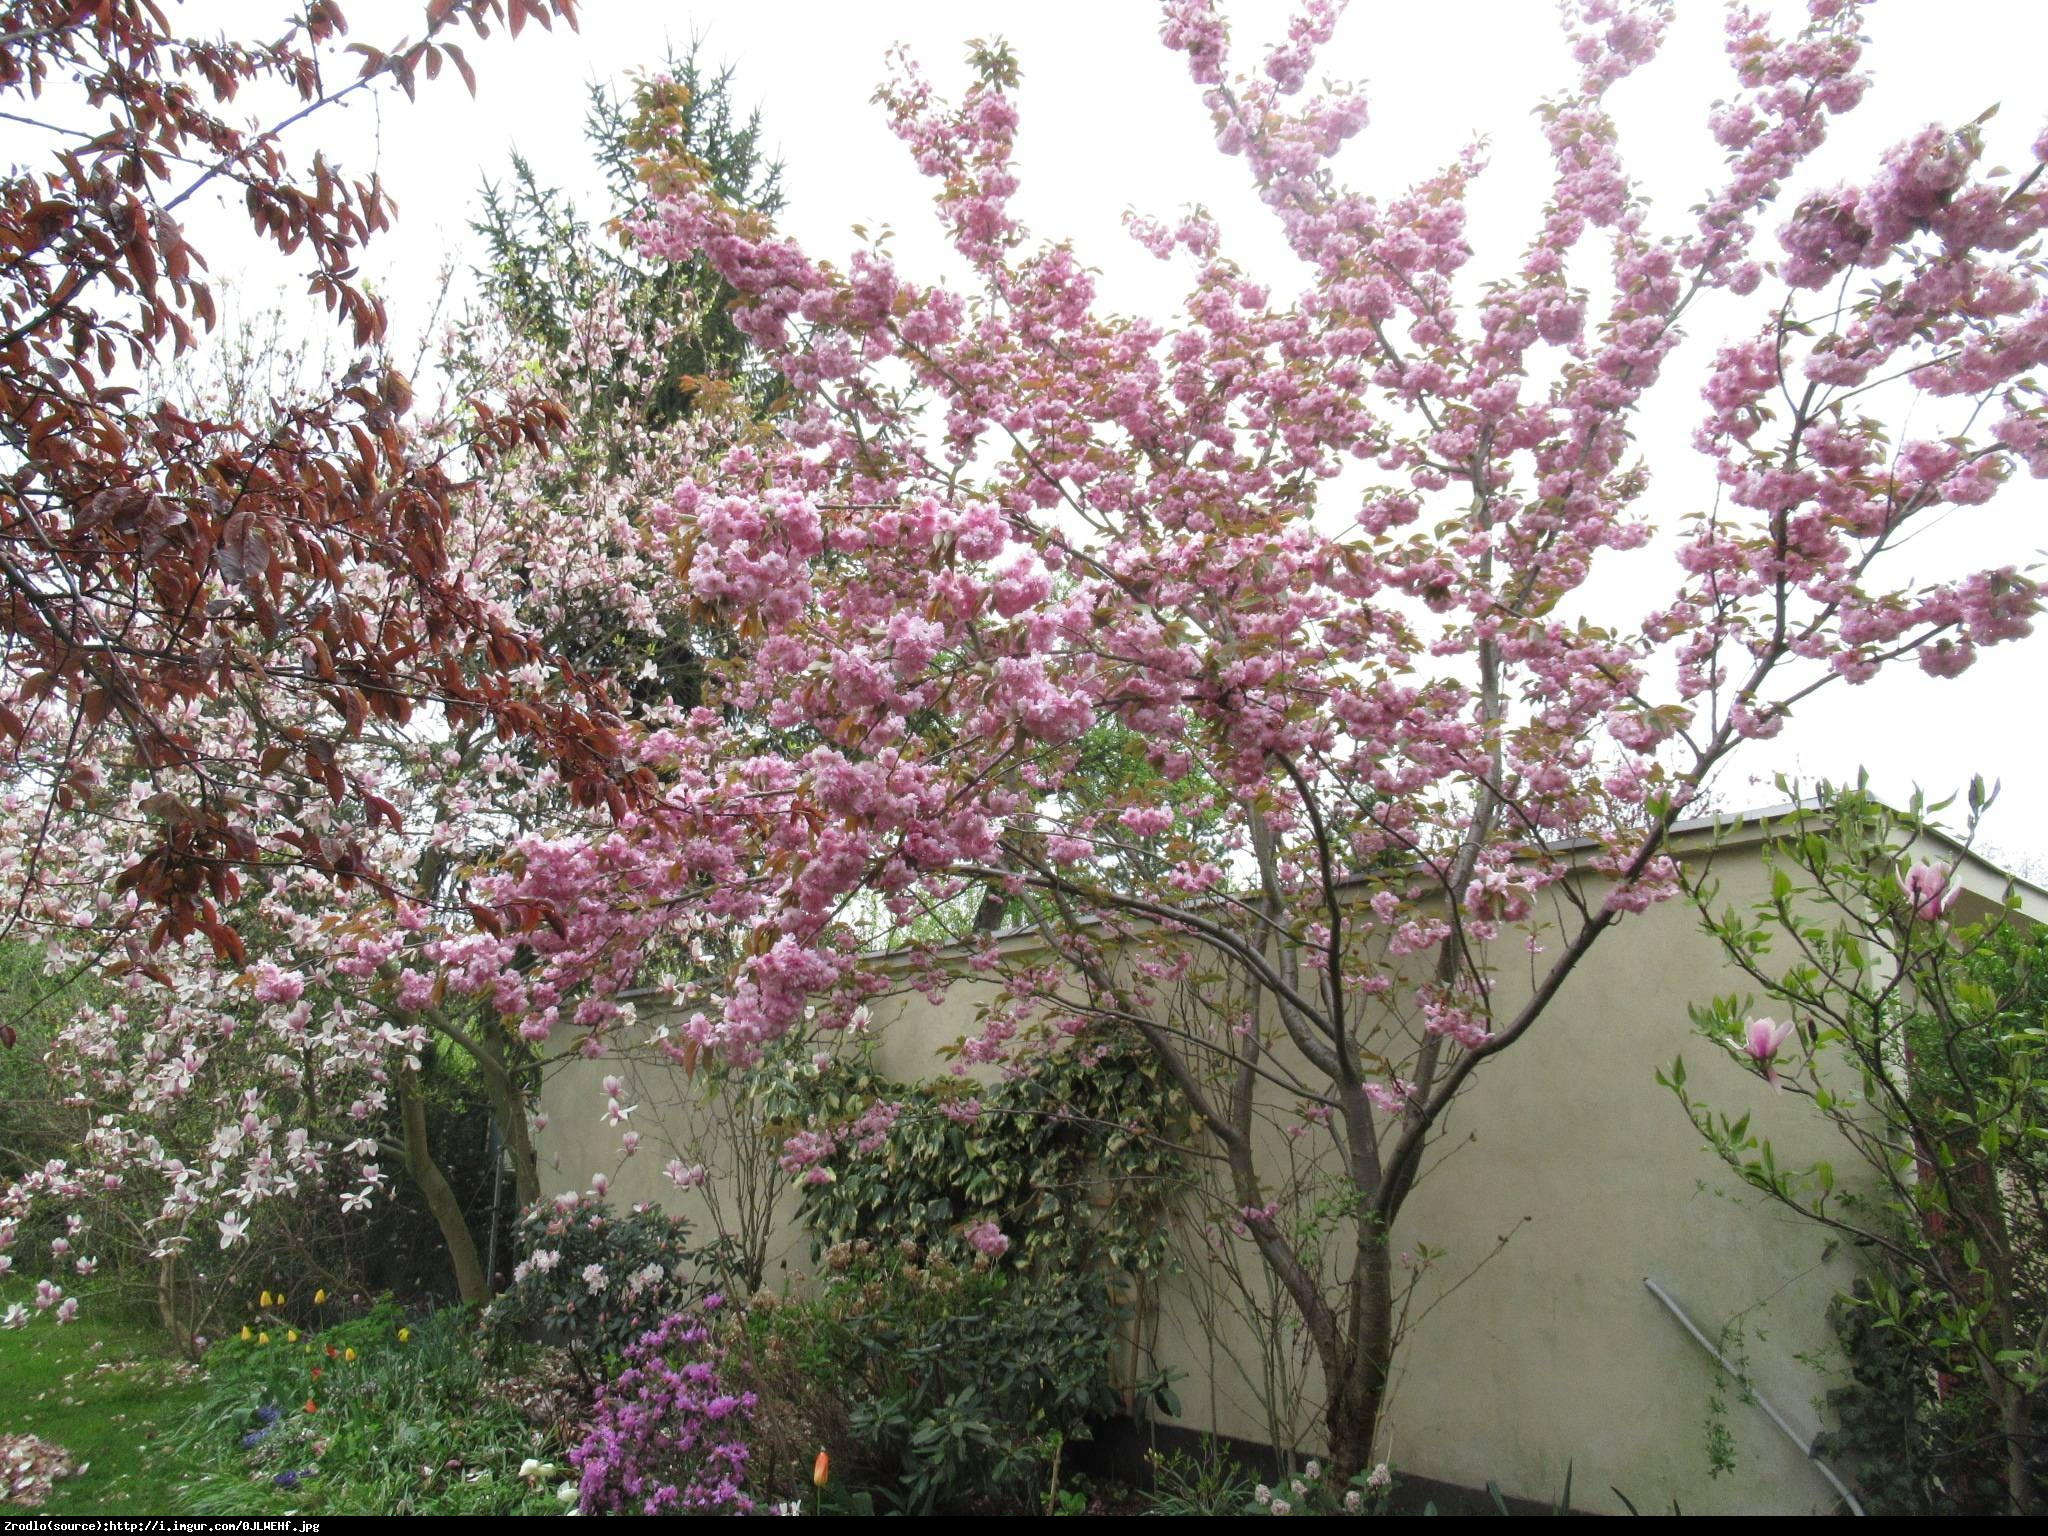 Wiśnia piłkowana kikushidare-zakura - Prunus serrulata kiku-shidare-zakura